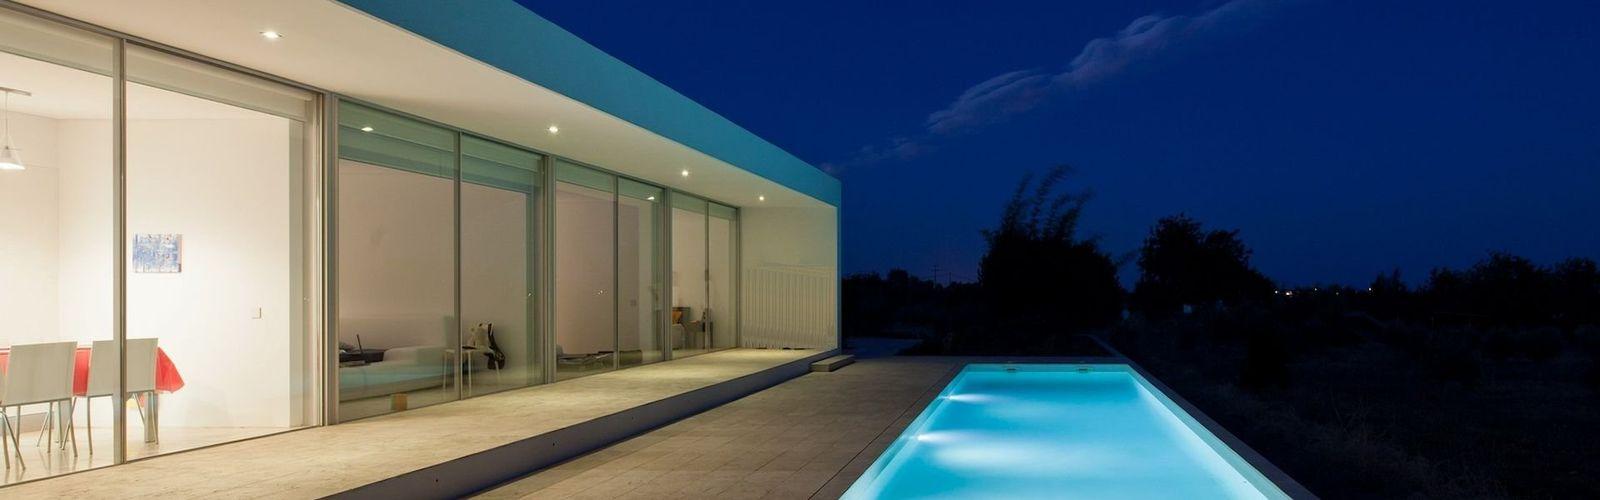 Real Estate Ktimatomesitiki Viotias, Livadia